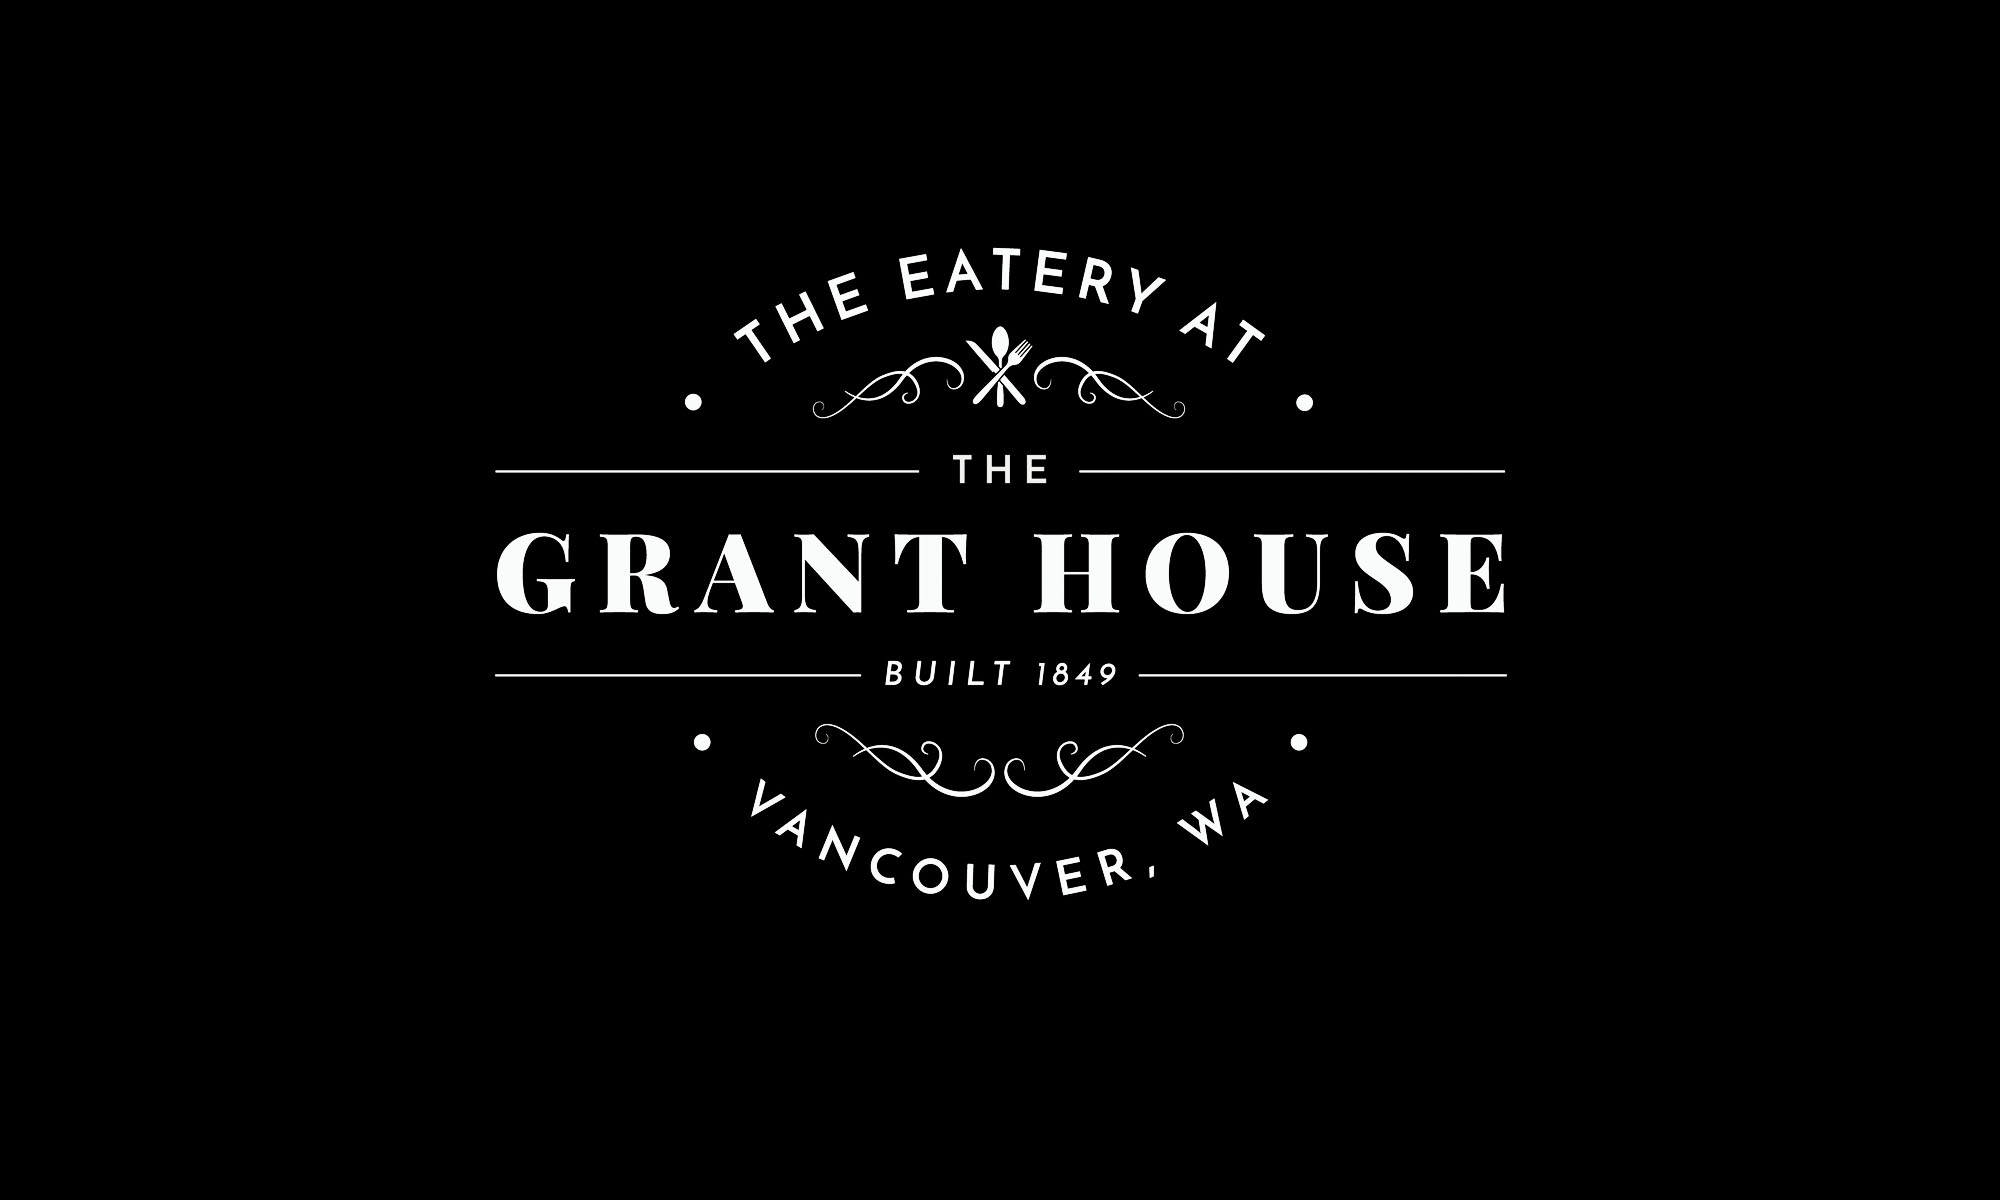 GrantHouse5.jpg